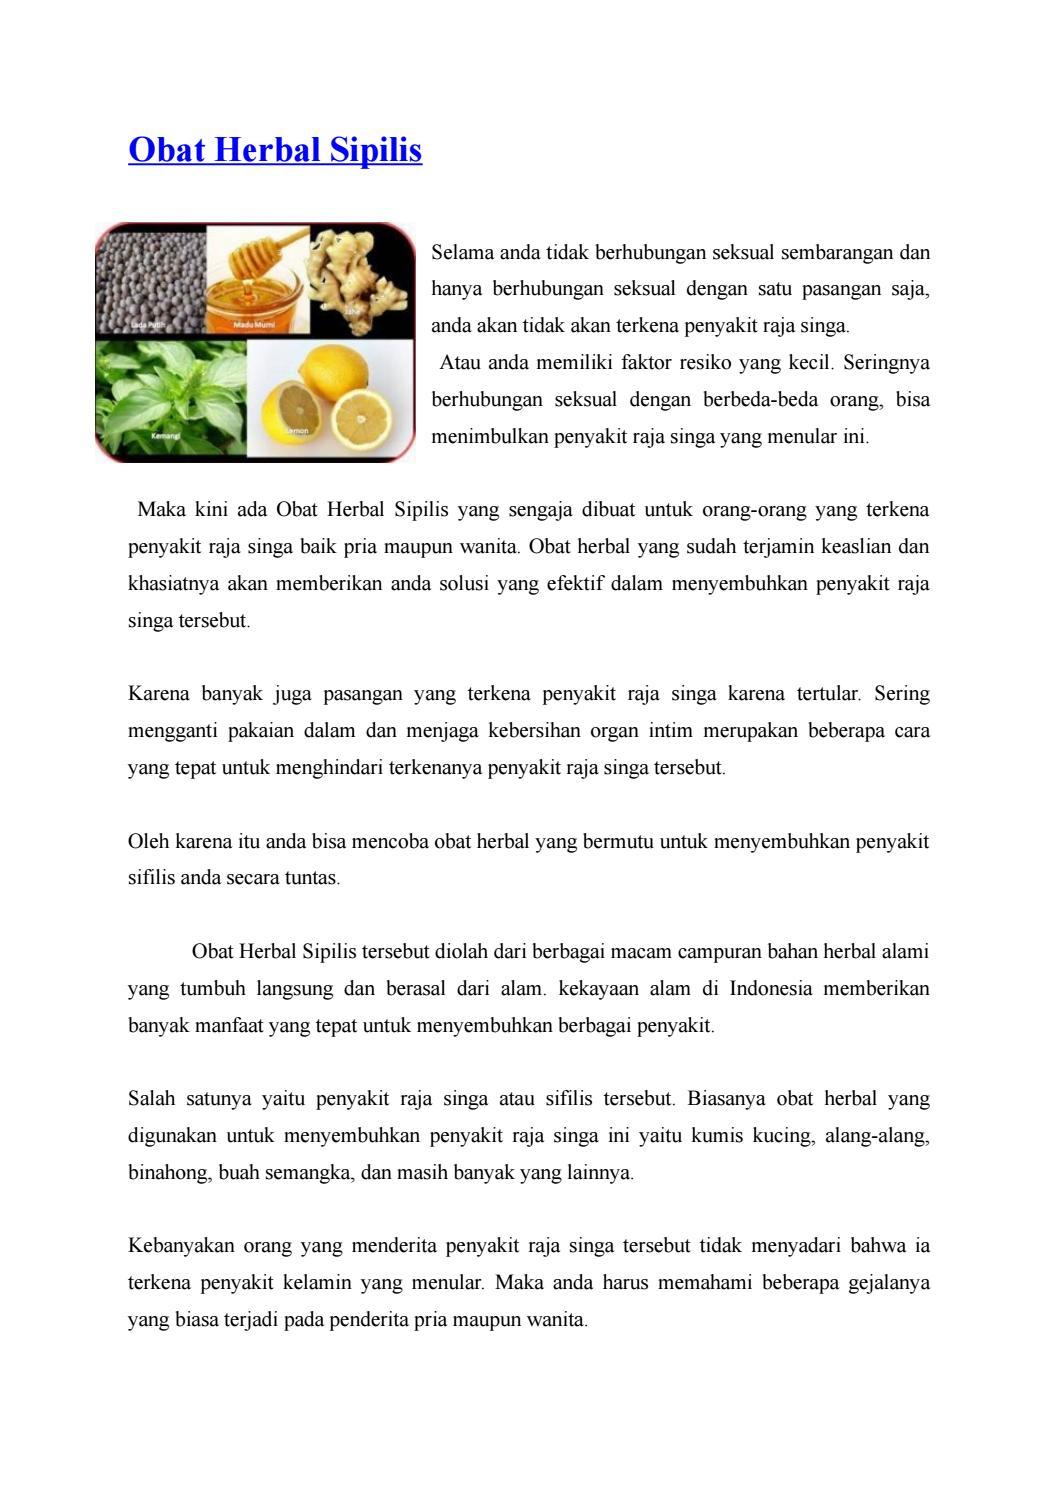 Obat Herbal Sipilis By Denature Indonesia Issuu Sakit Go Gonore Raja Singa Isk